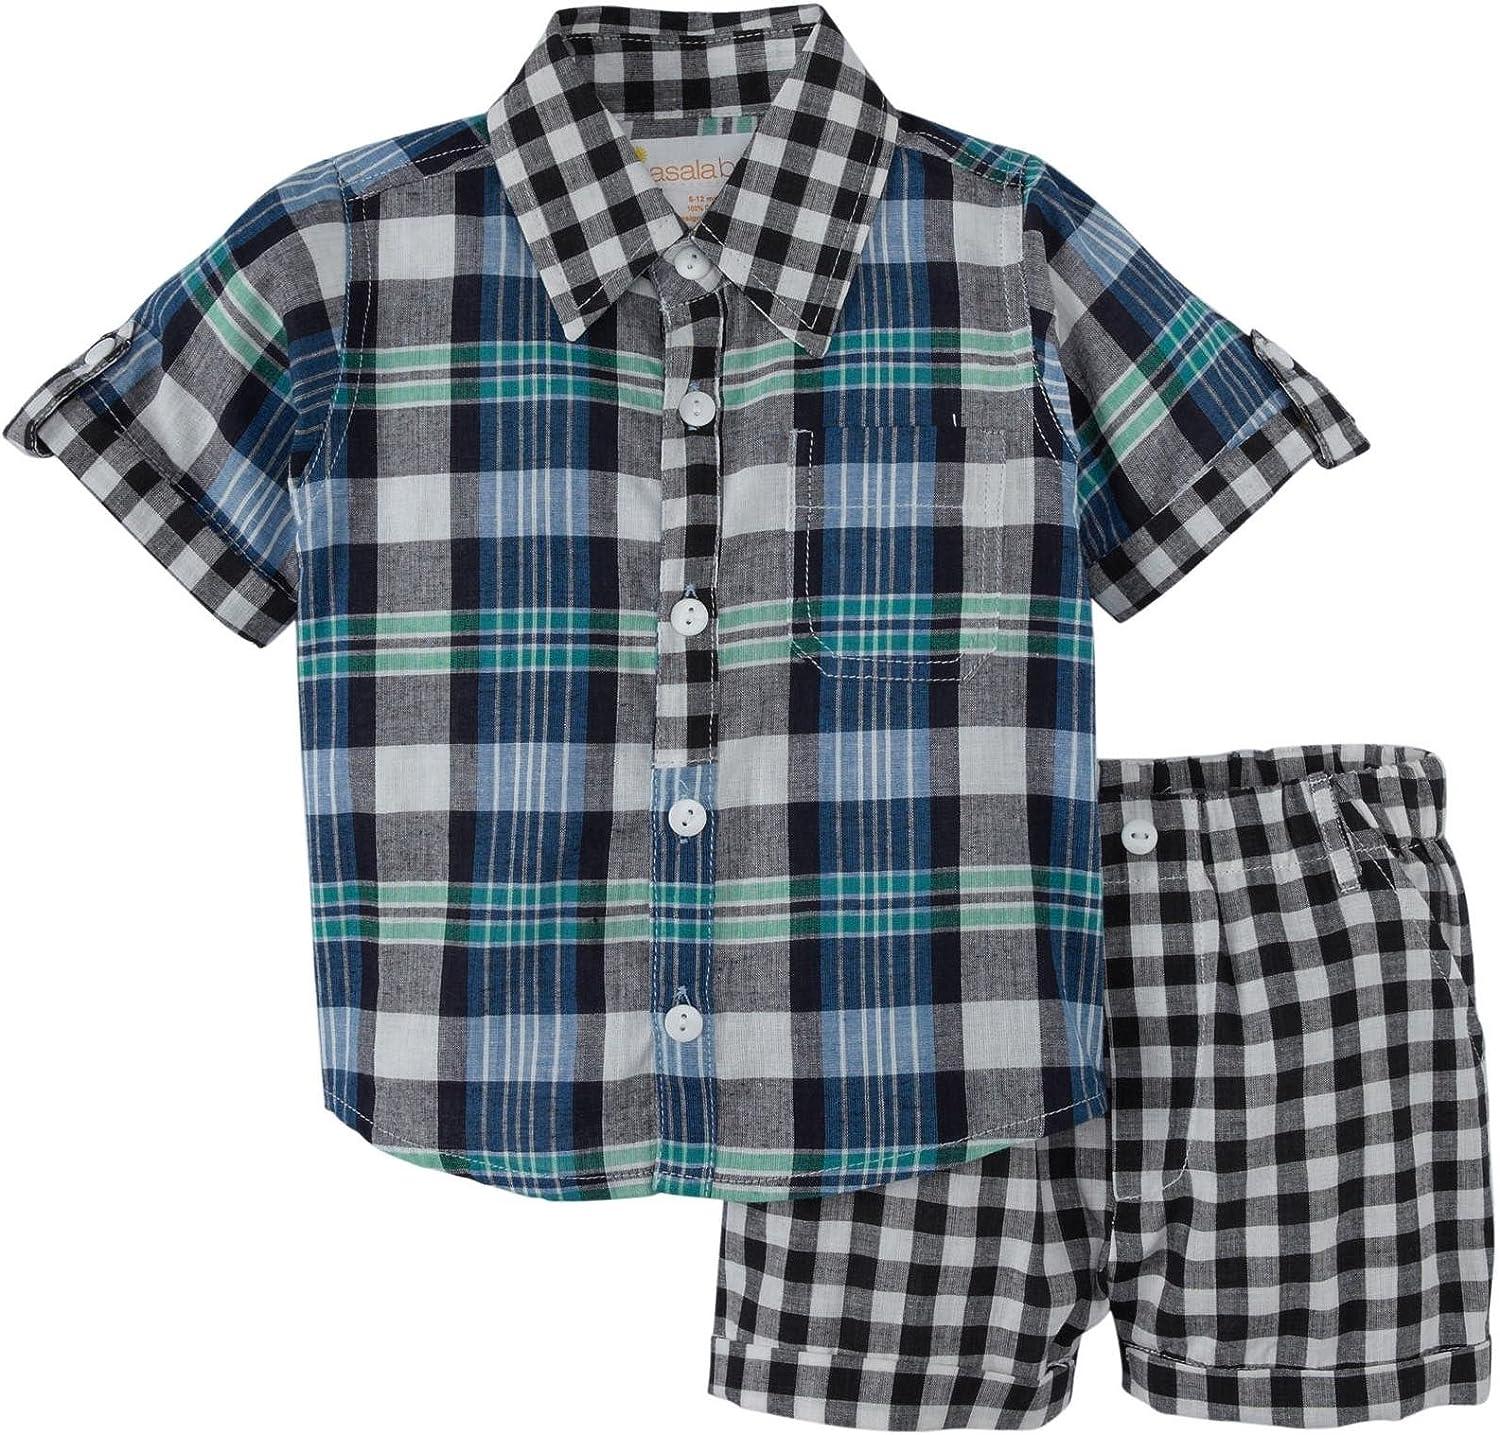 Masala Neat Shirt 2 Piece Set (Baby) Navy